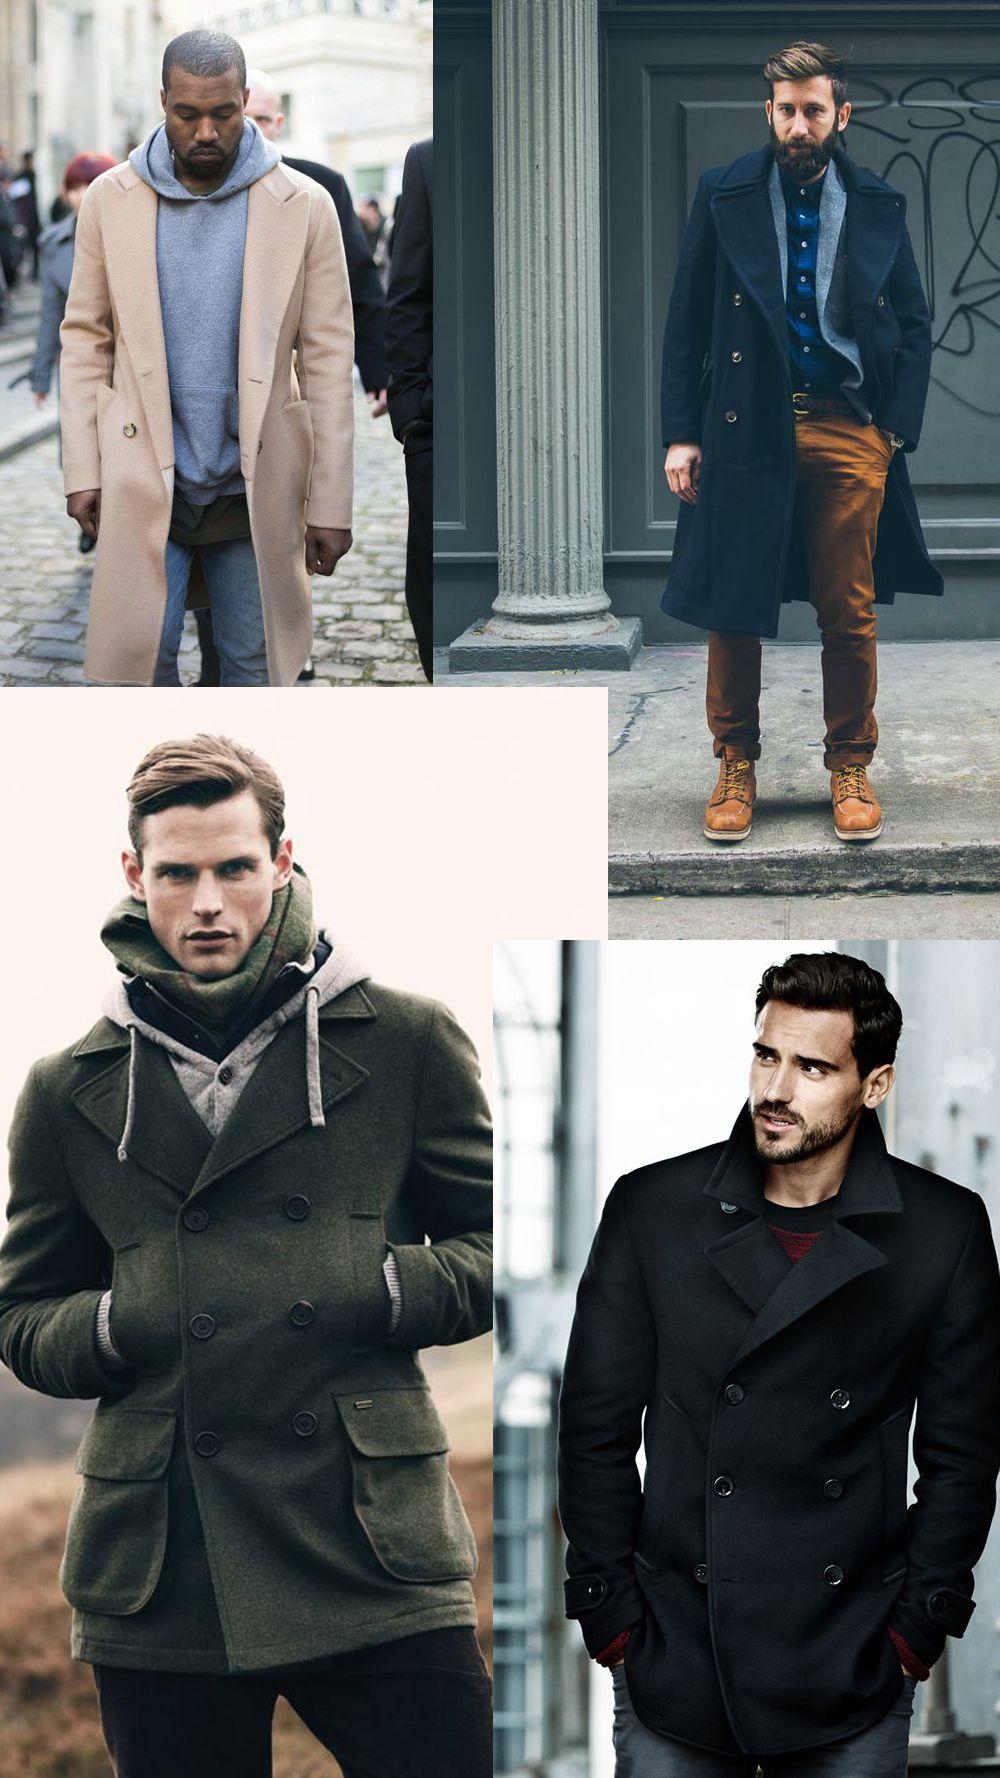 Men's Winter Fashion 2020 Guide Winter outfits men, Mens